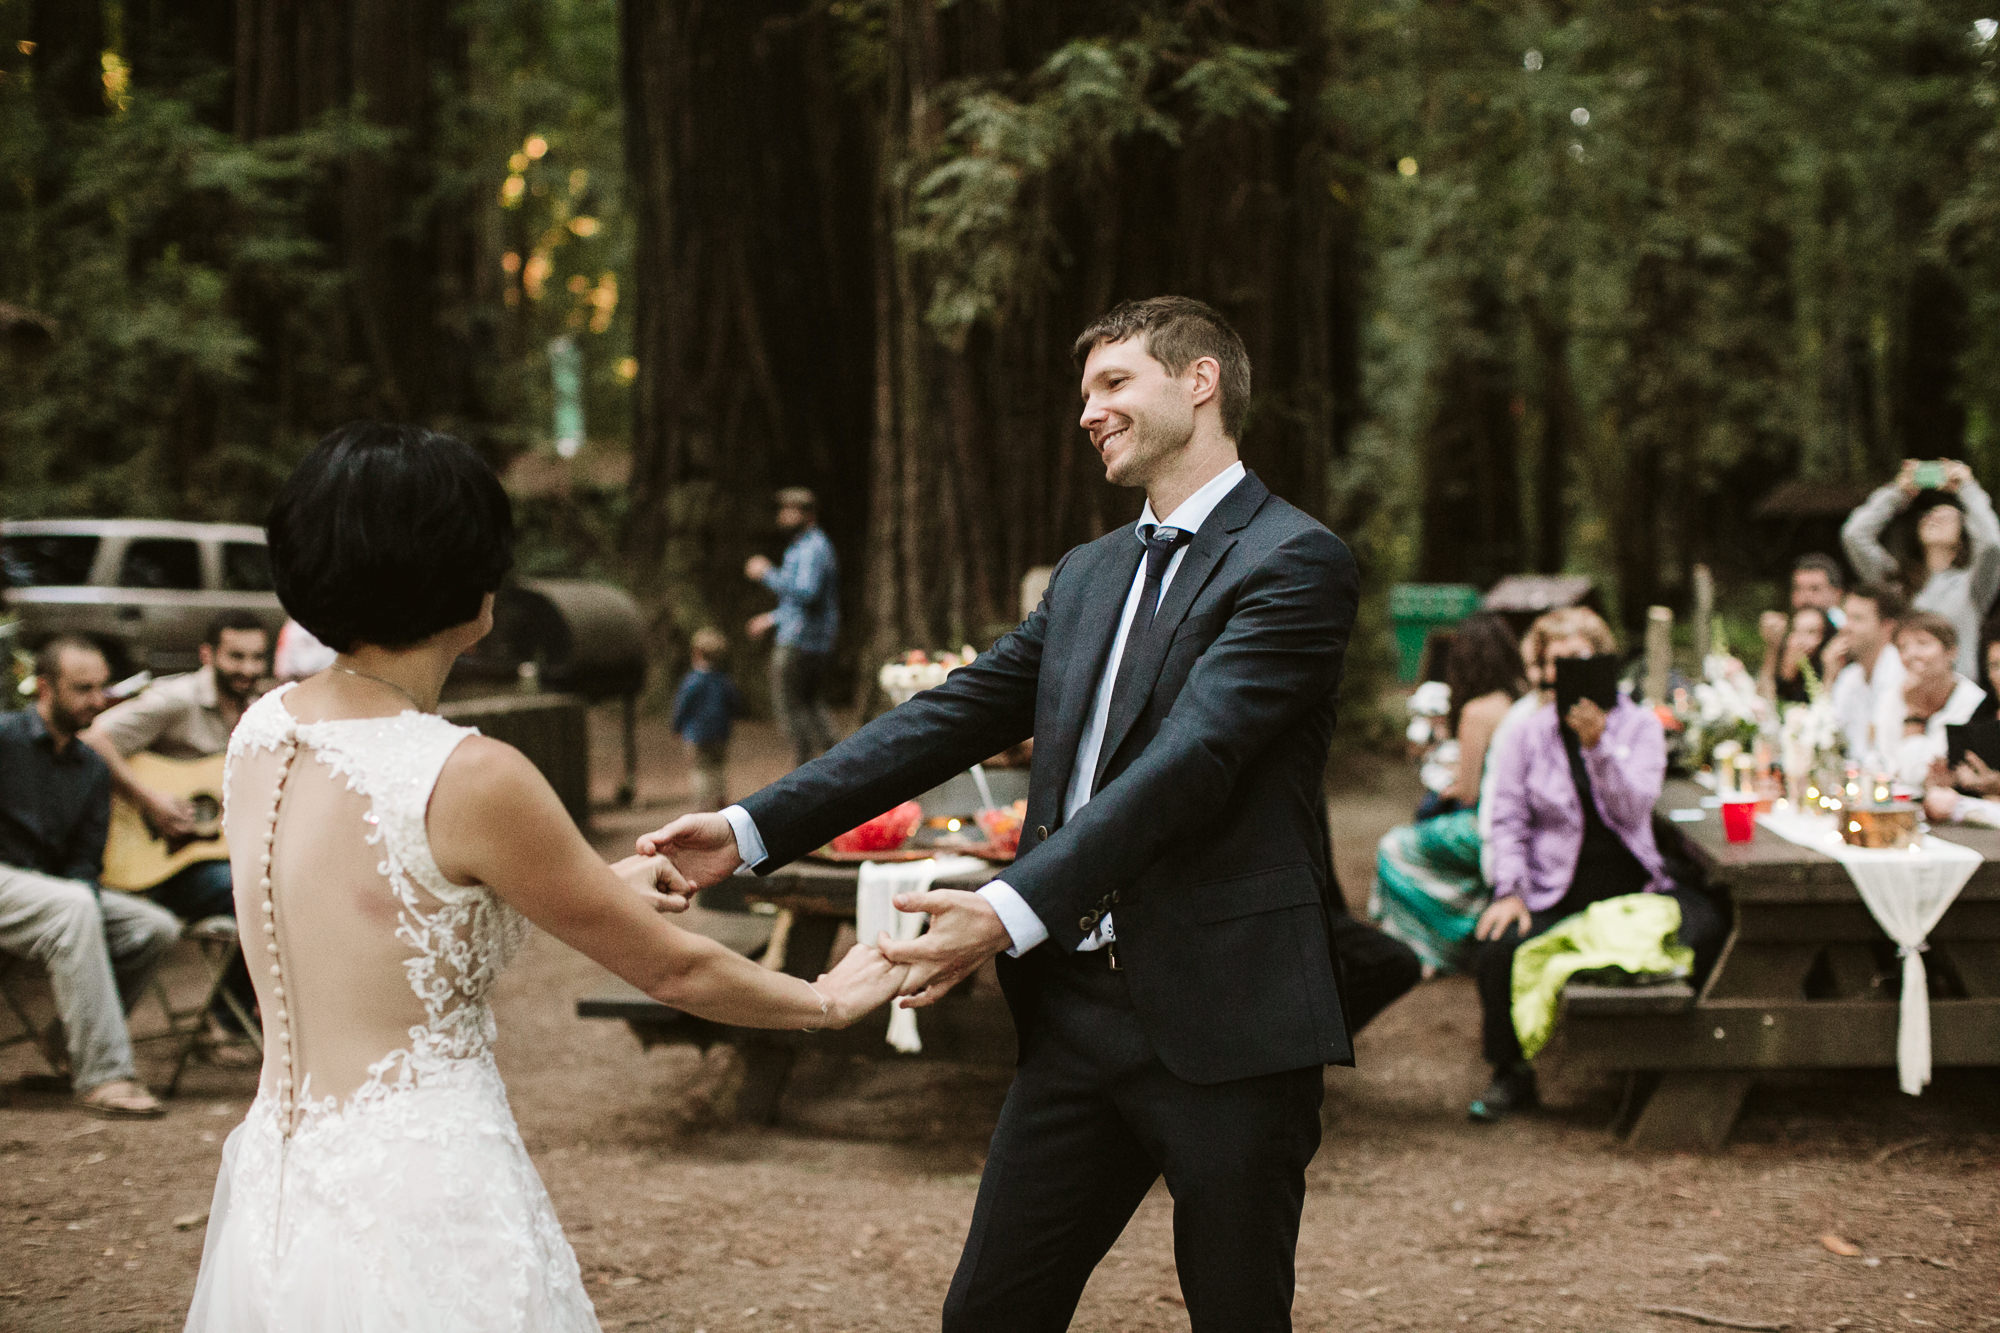 California-wedding-photographer-alfonso-flores-pamplin-groove-326.jpg